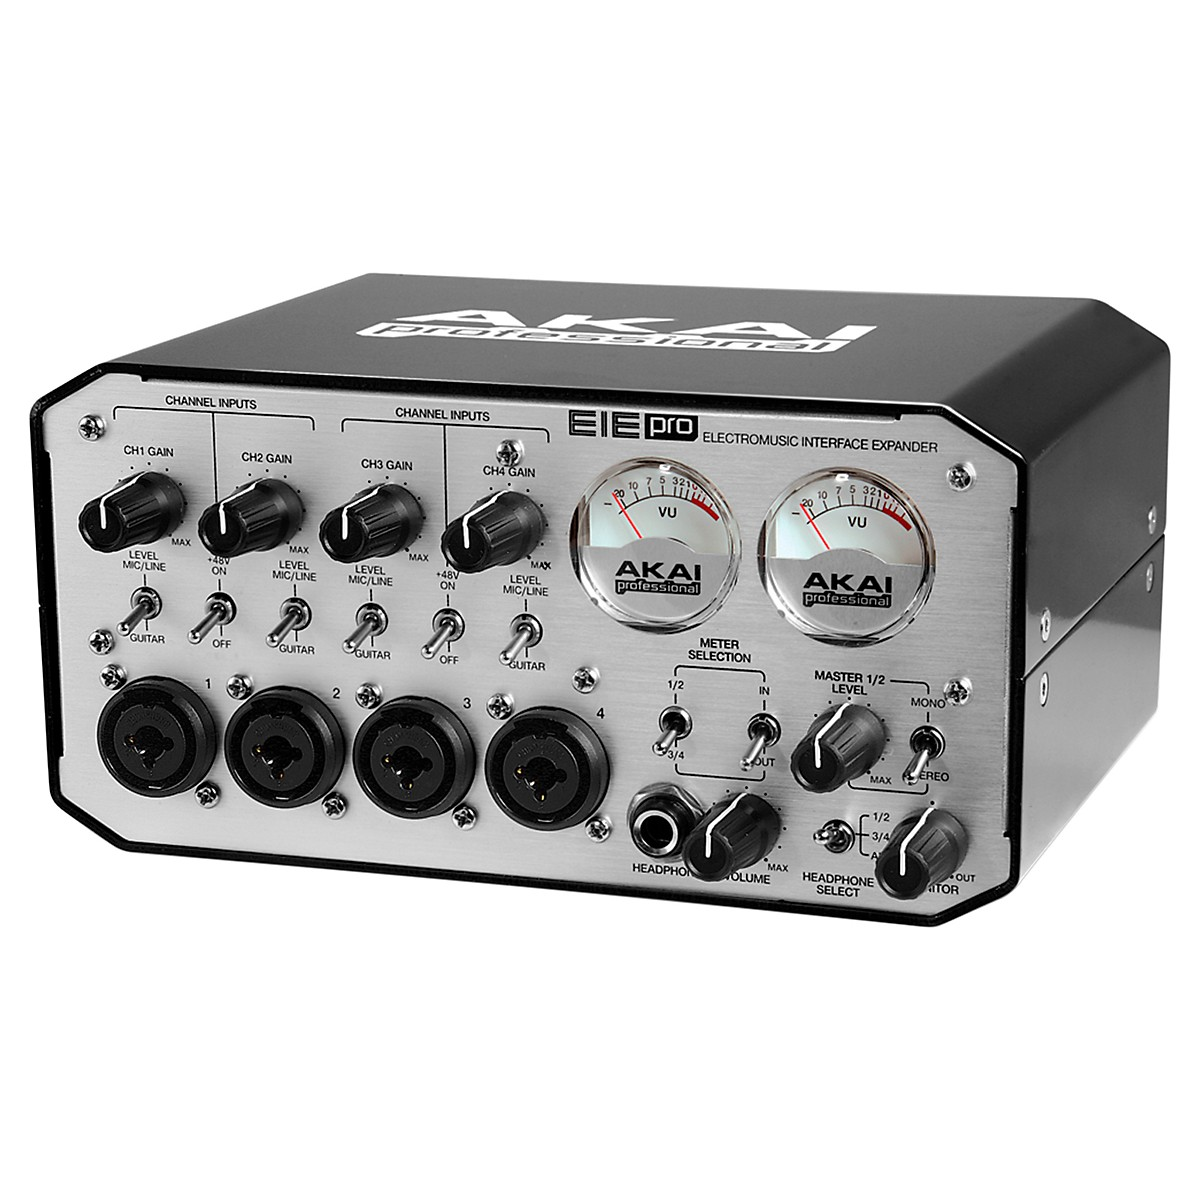 Akai Professional EIE PRO 24-bit Audio/MIDI Interface with USB Hub